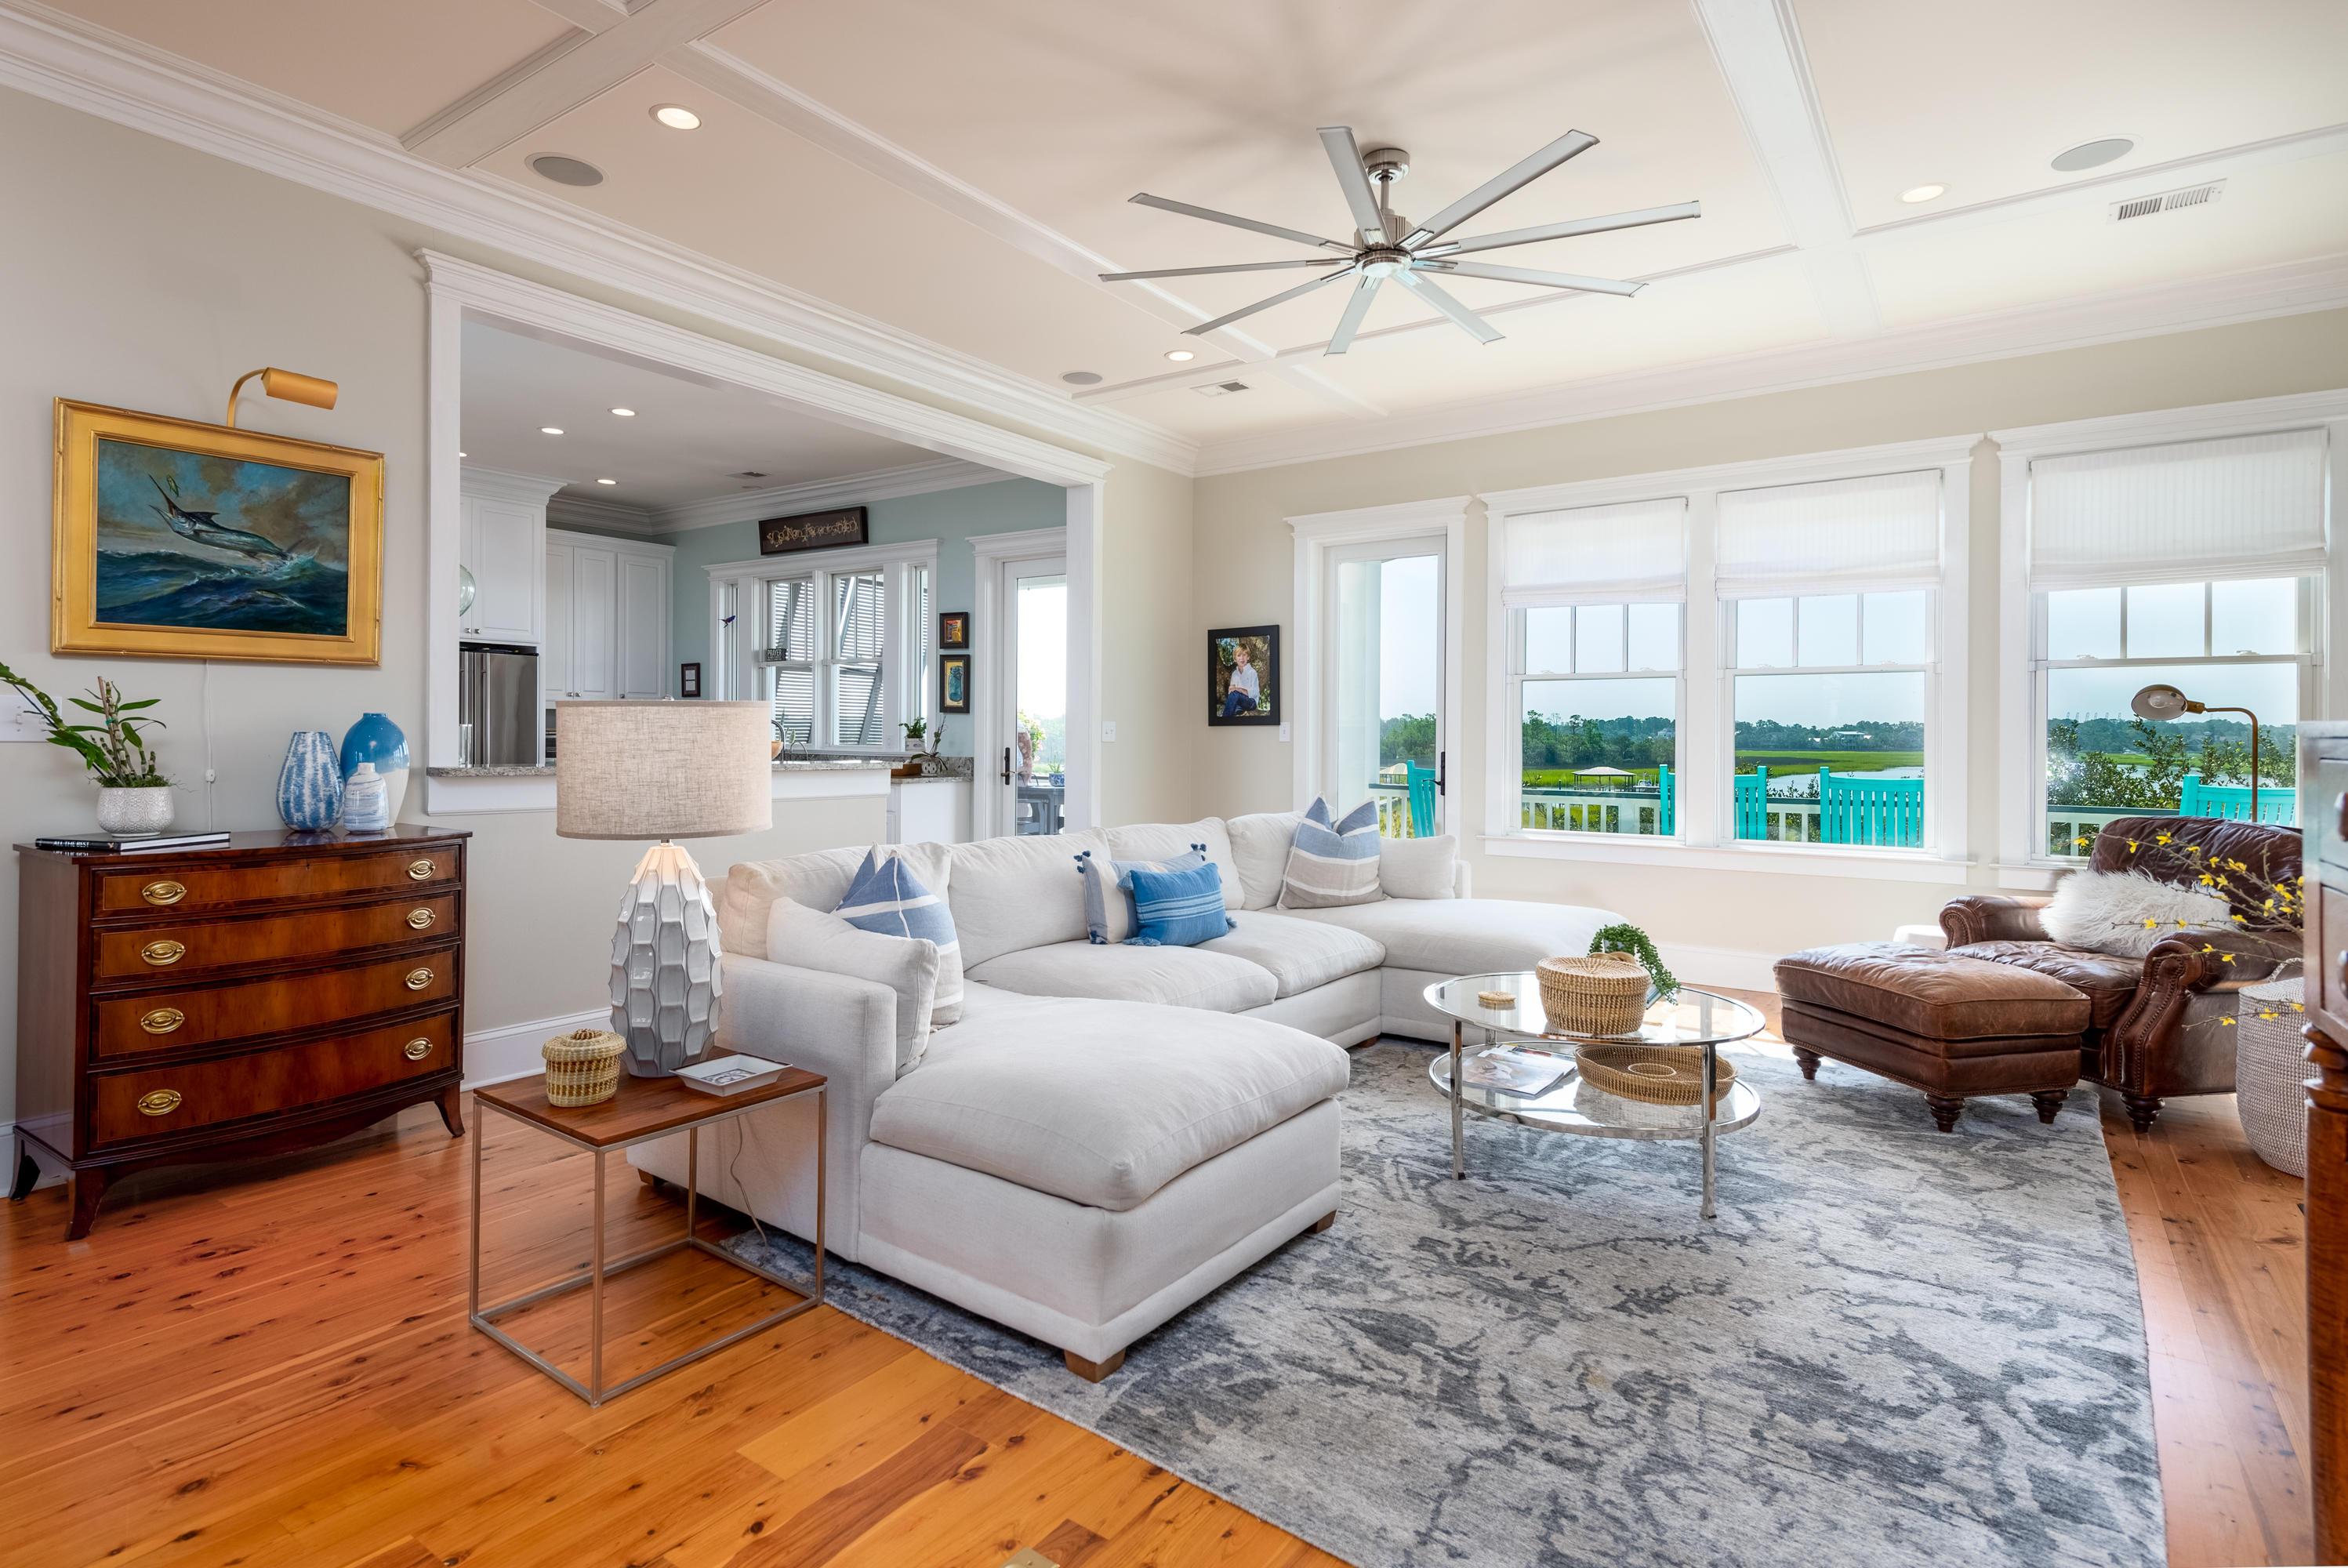 Beresford Creek Landing Homes For Sale - 1017 Rivershore, Charleston, SC - 46